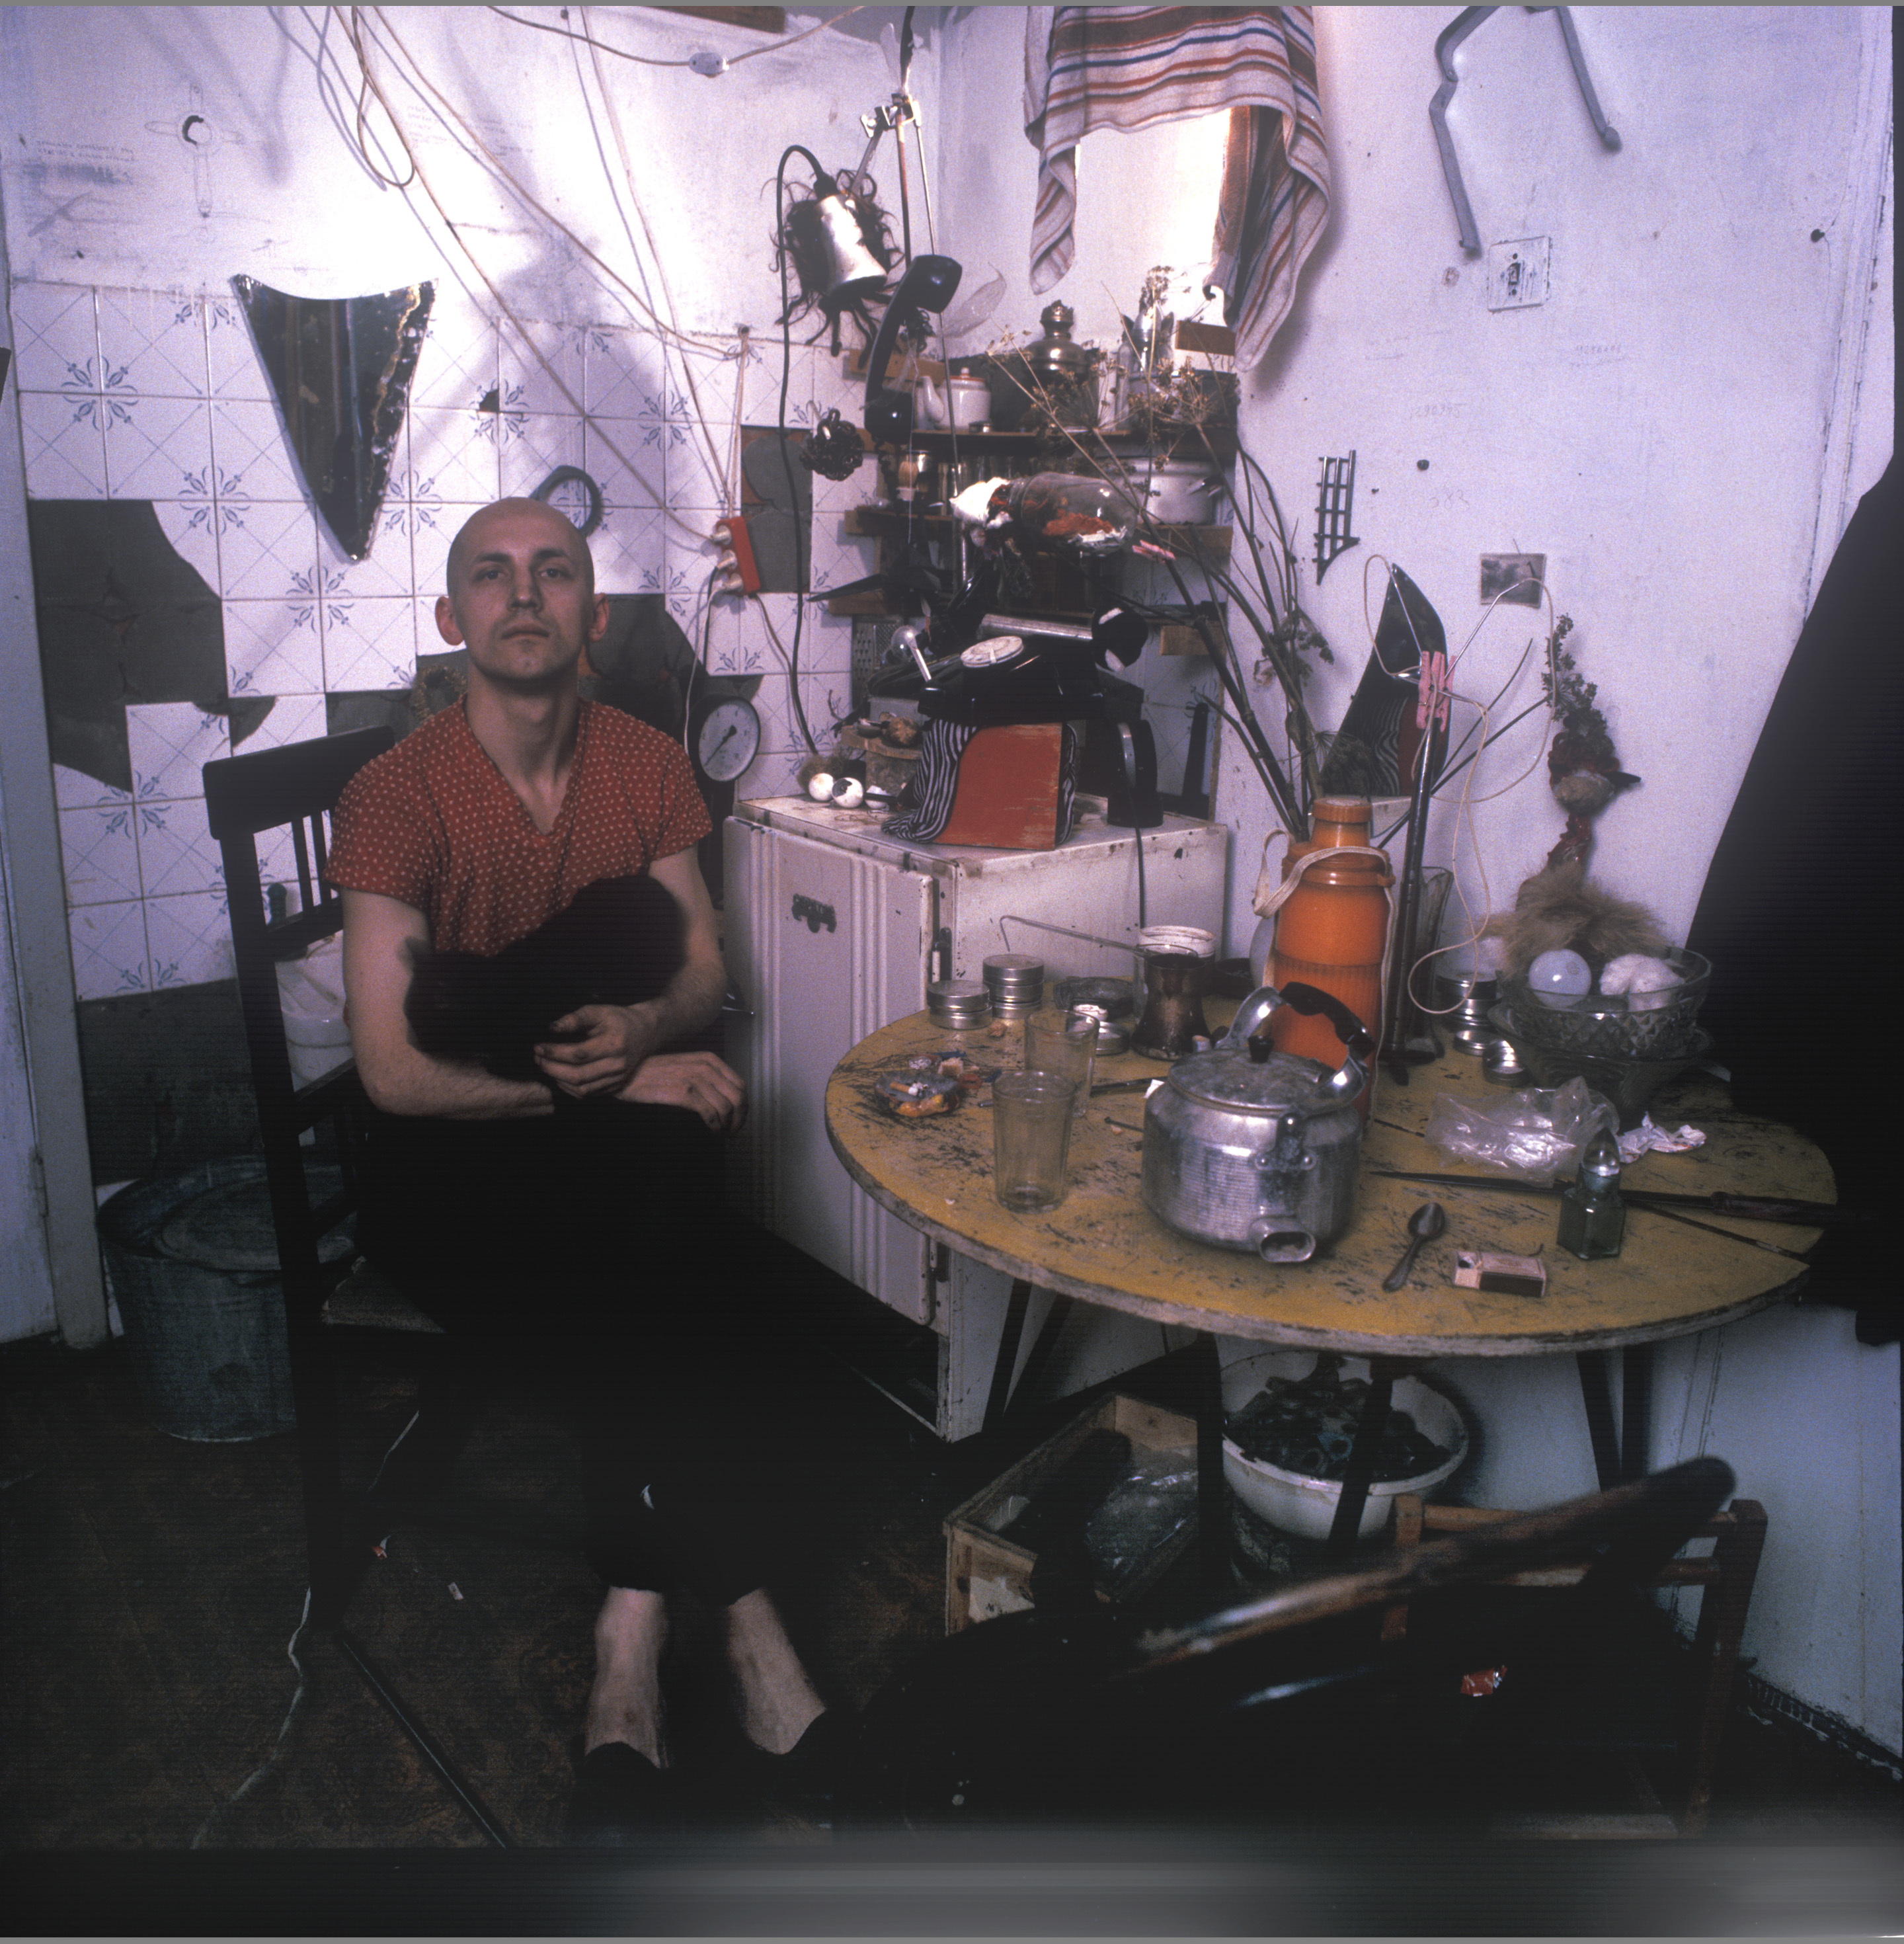 detskij-sad-kuxnya-1986